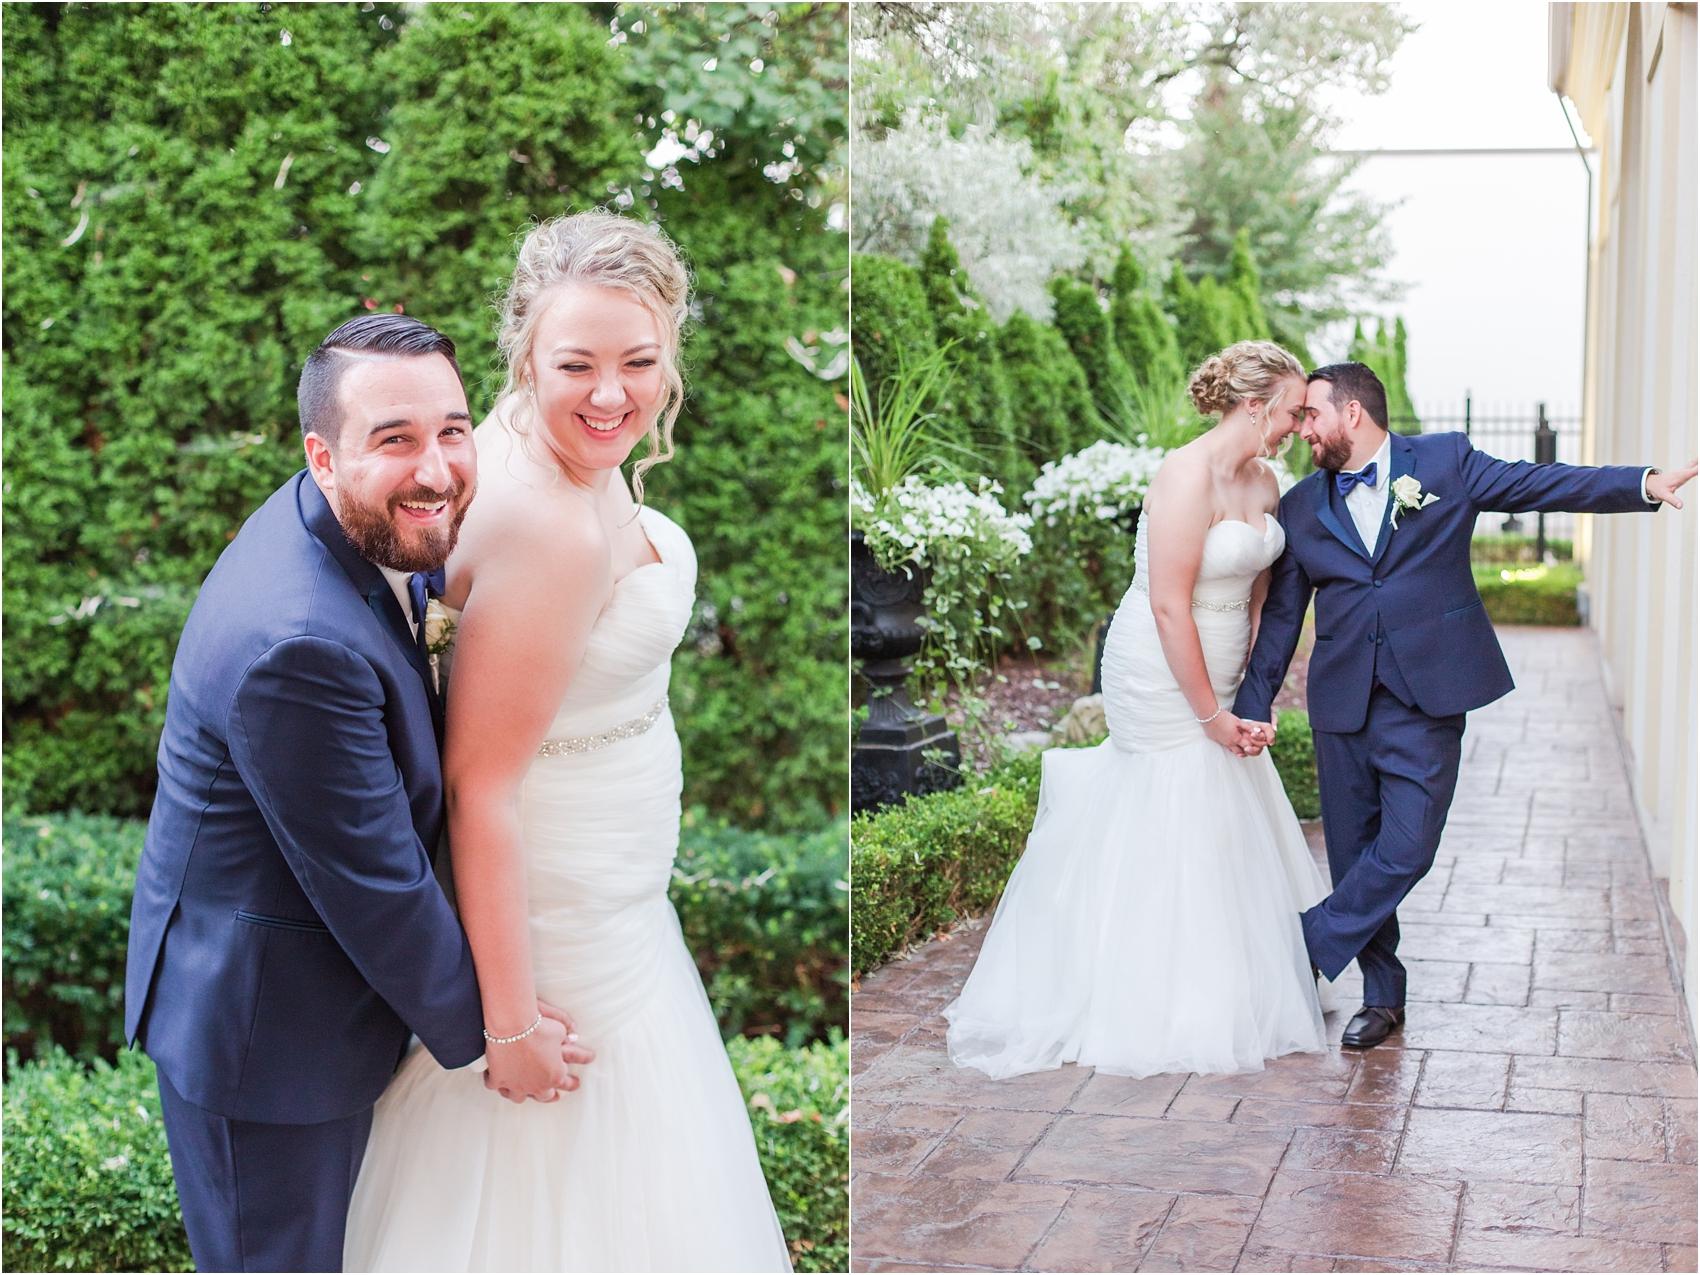 joyful-and-candid-navy-blush-wedding-photos-at-crystal-gardens-in-howell-mi-by-courtney-carolyn-photography_0112.jpg